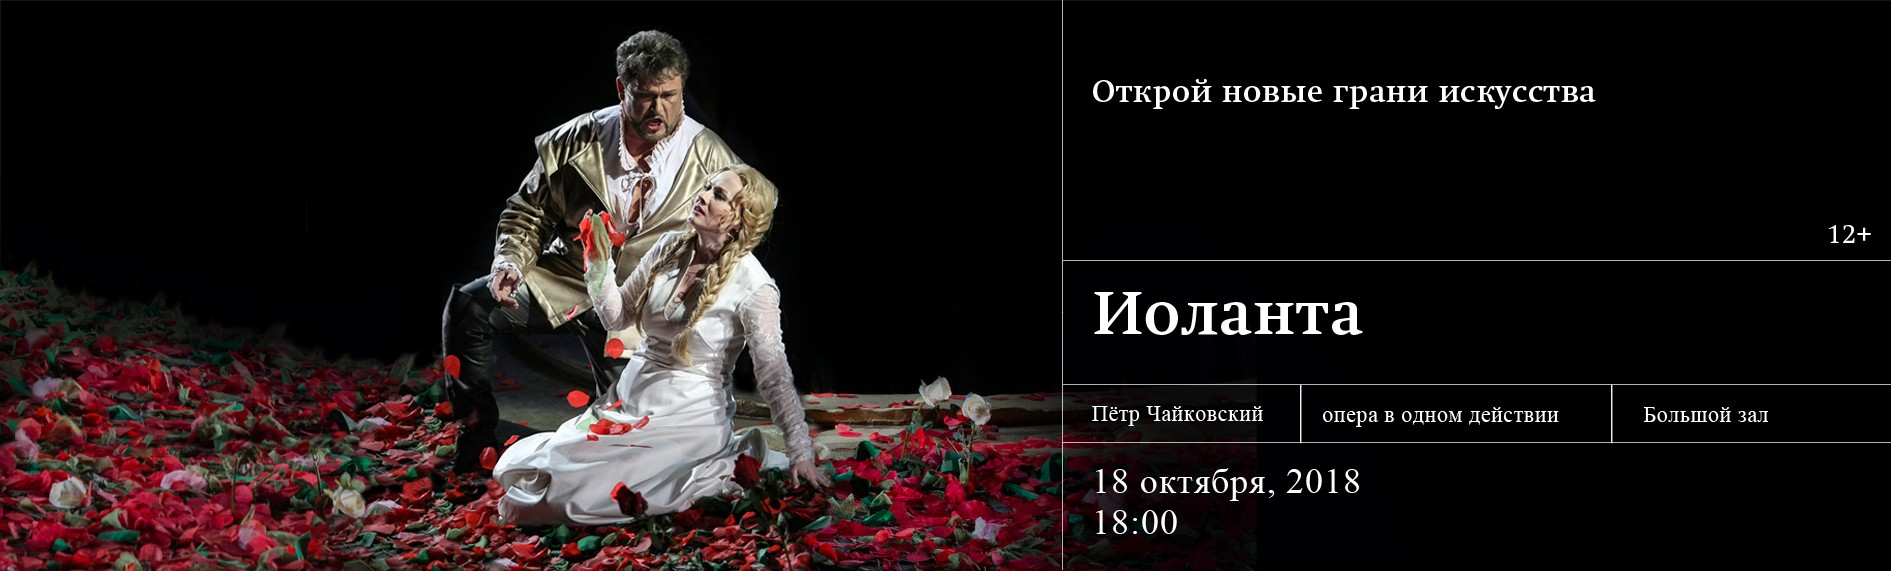 "Опера ""Иоланта"" октябрь"